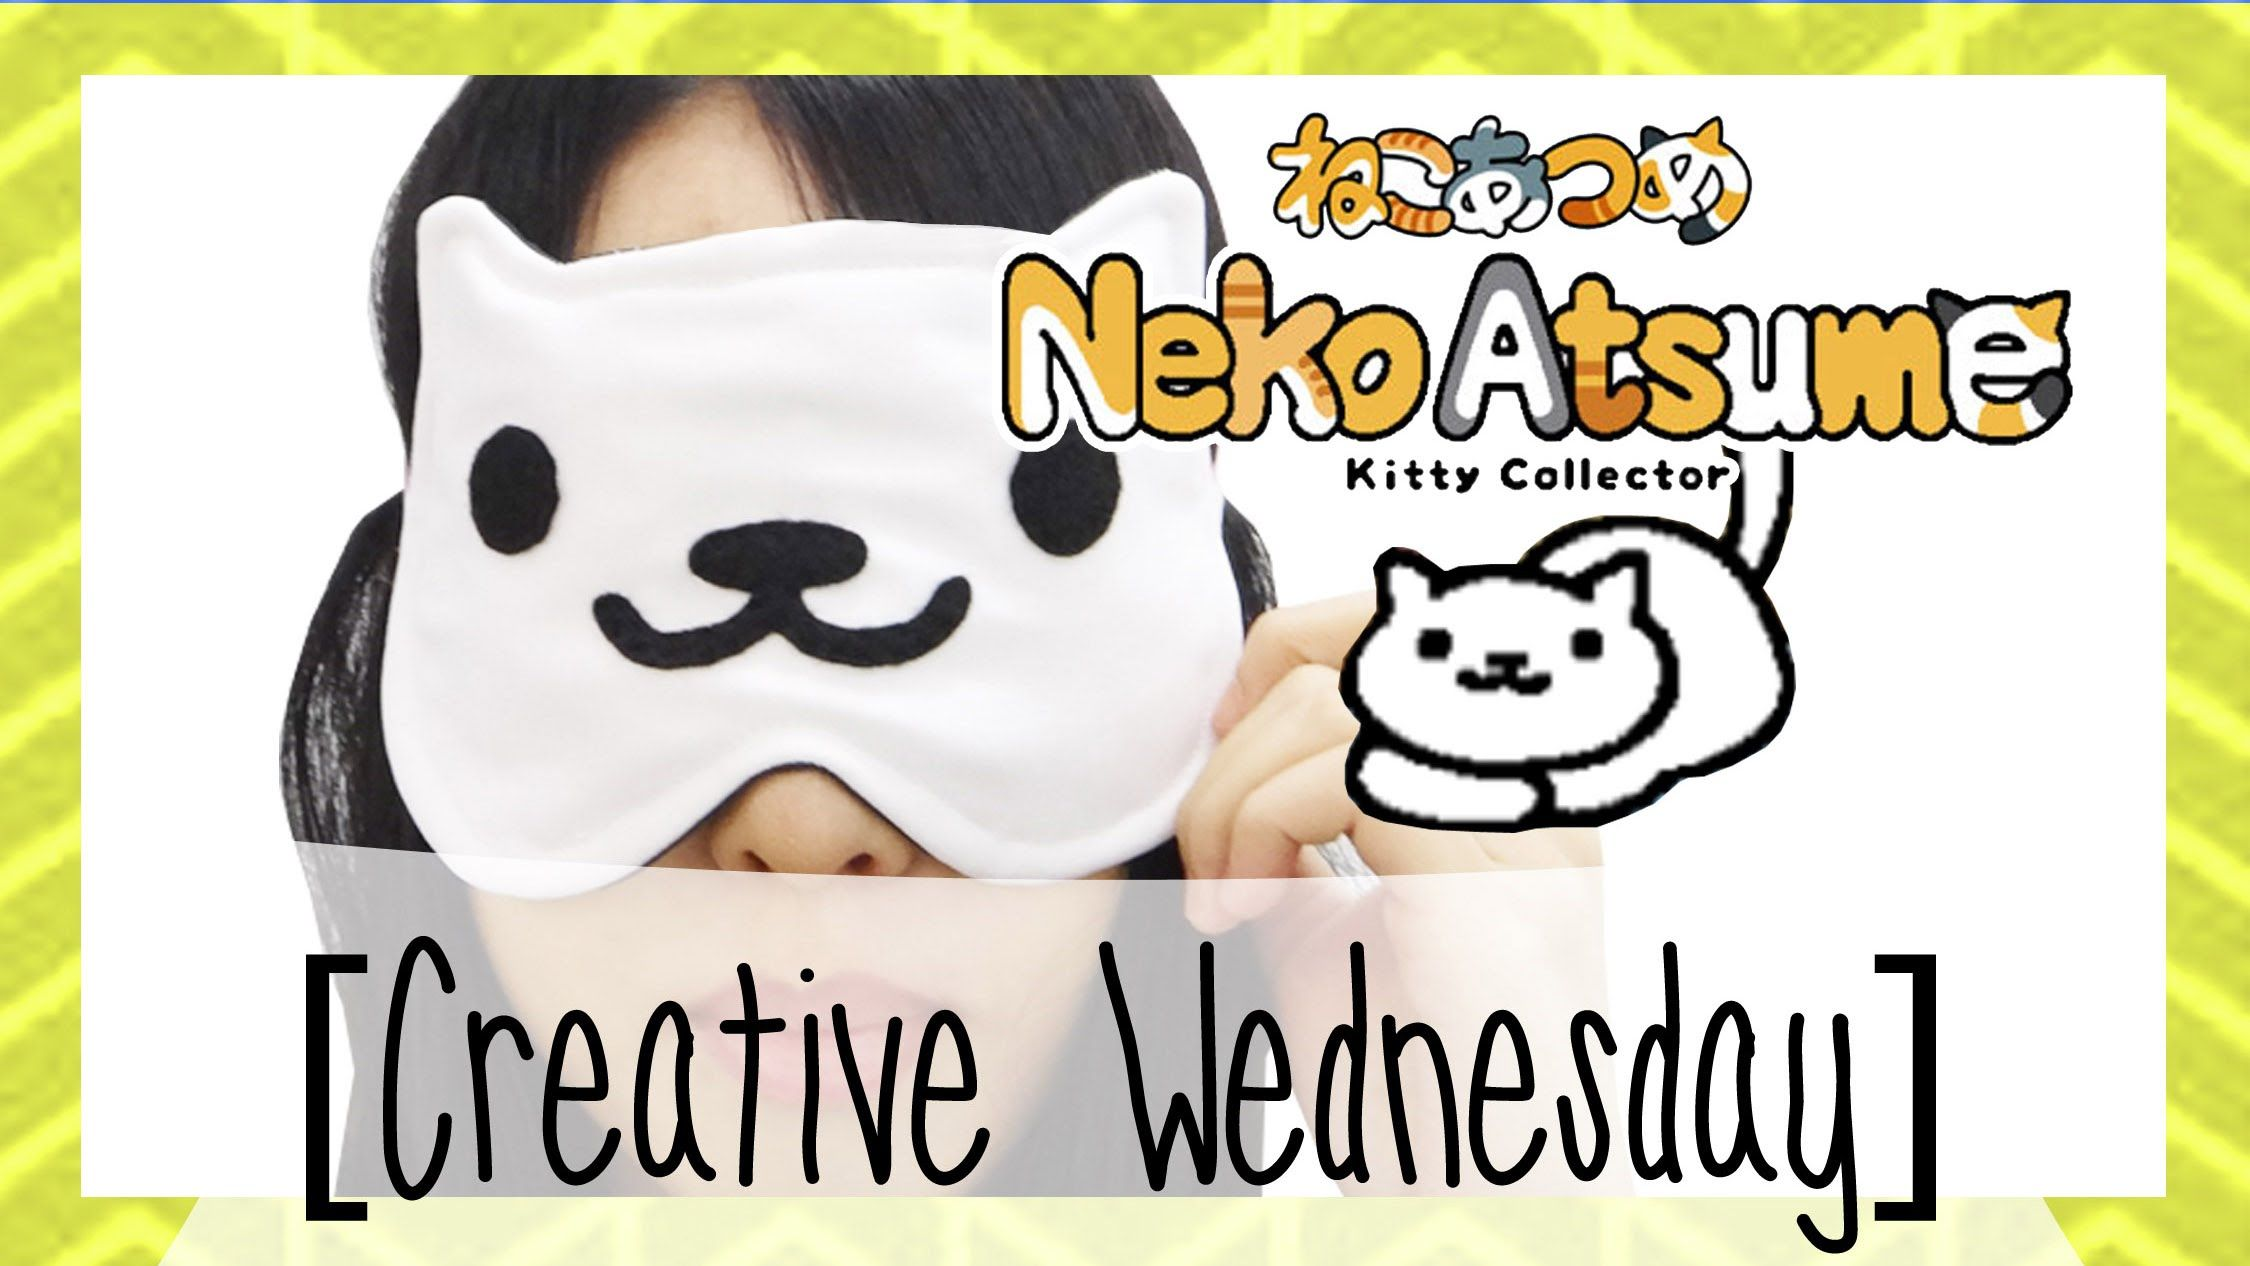 Learn how to make an adorable Neko Atsume cat sleeping